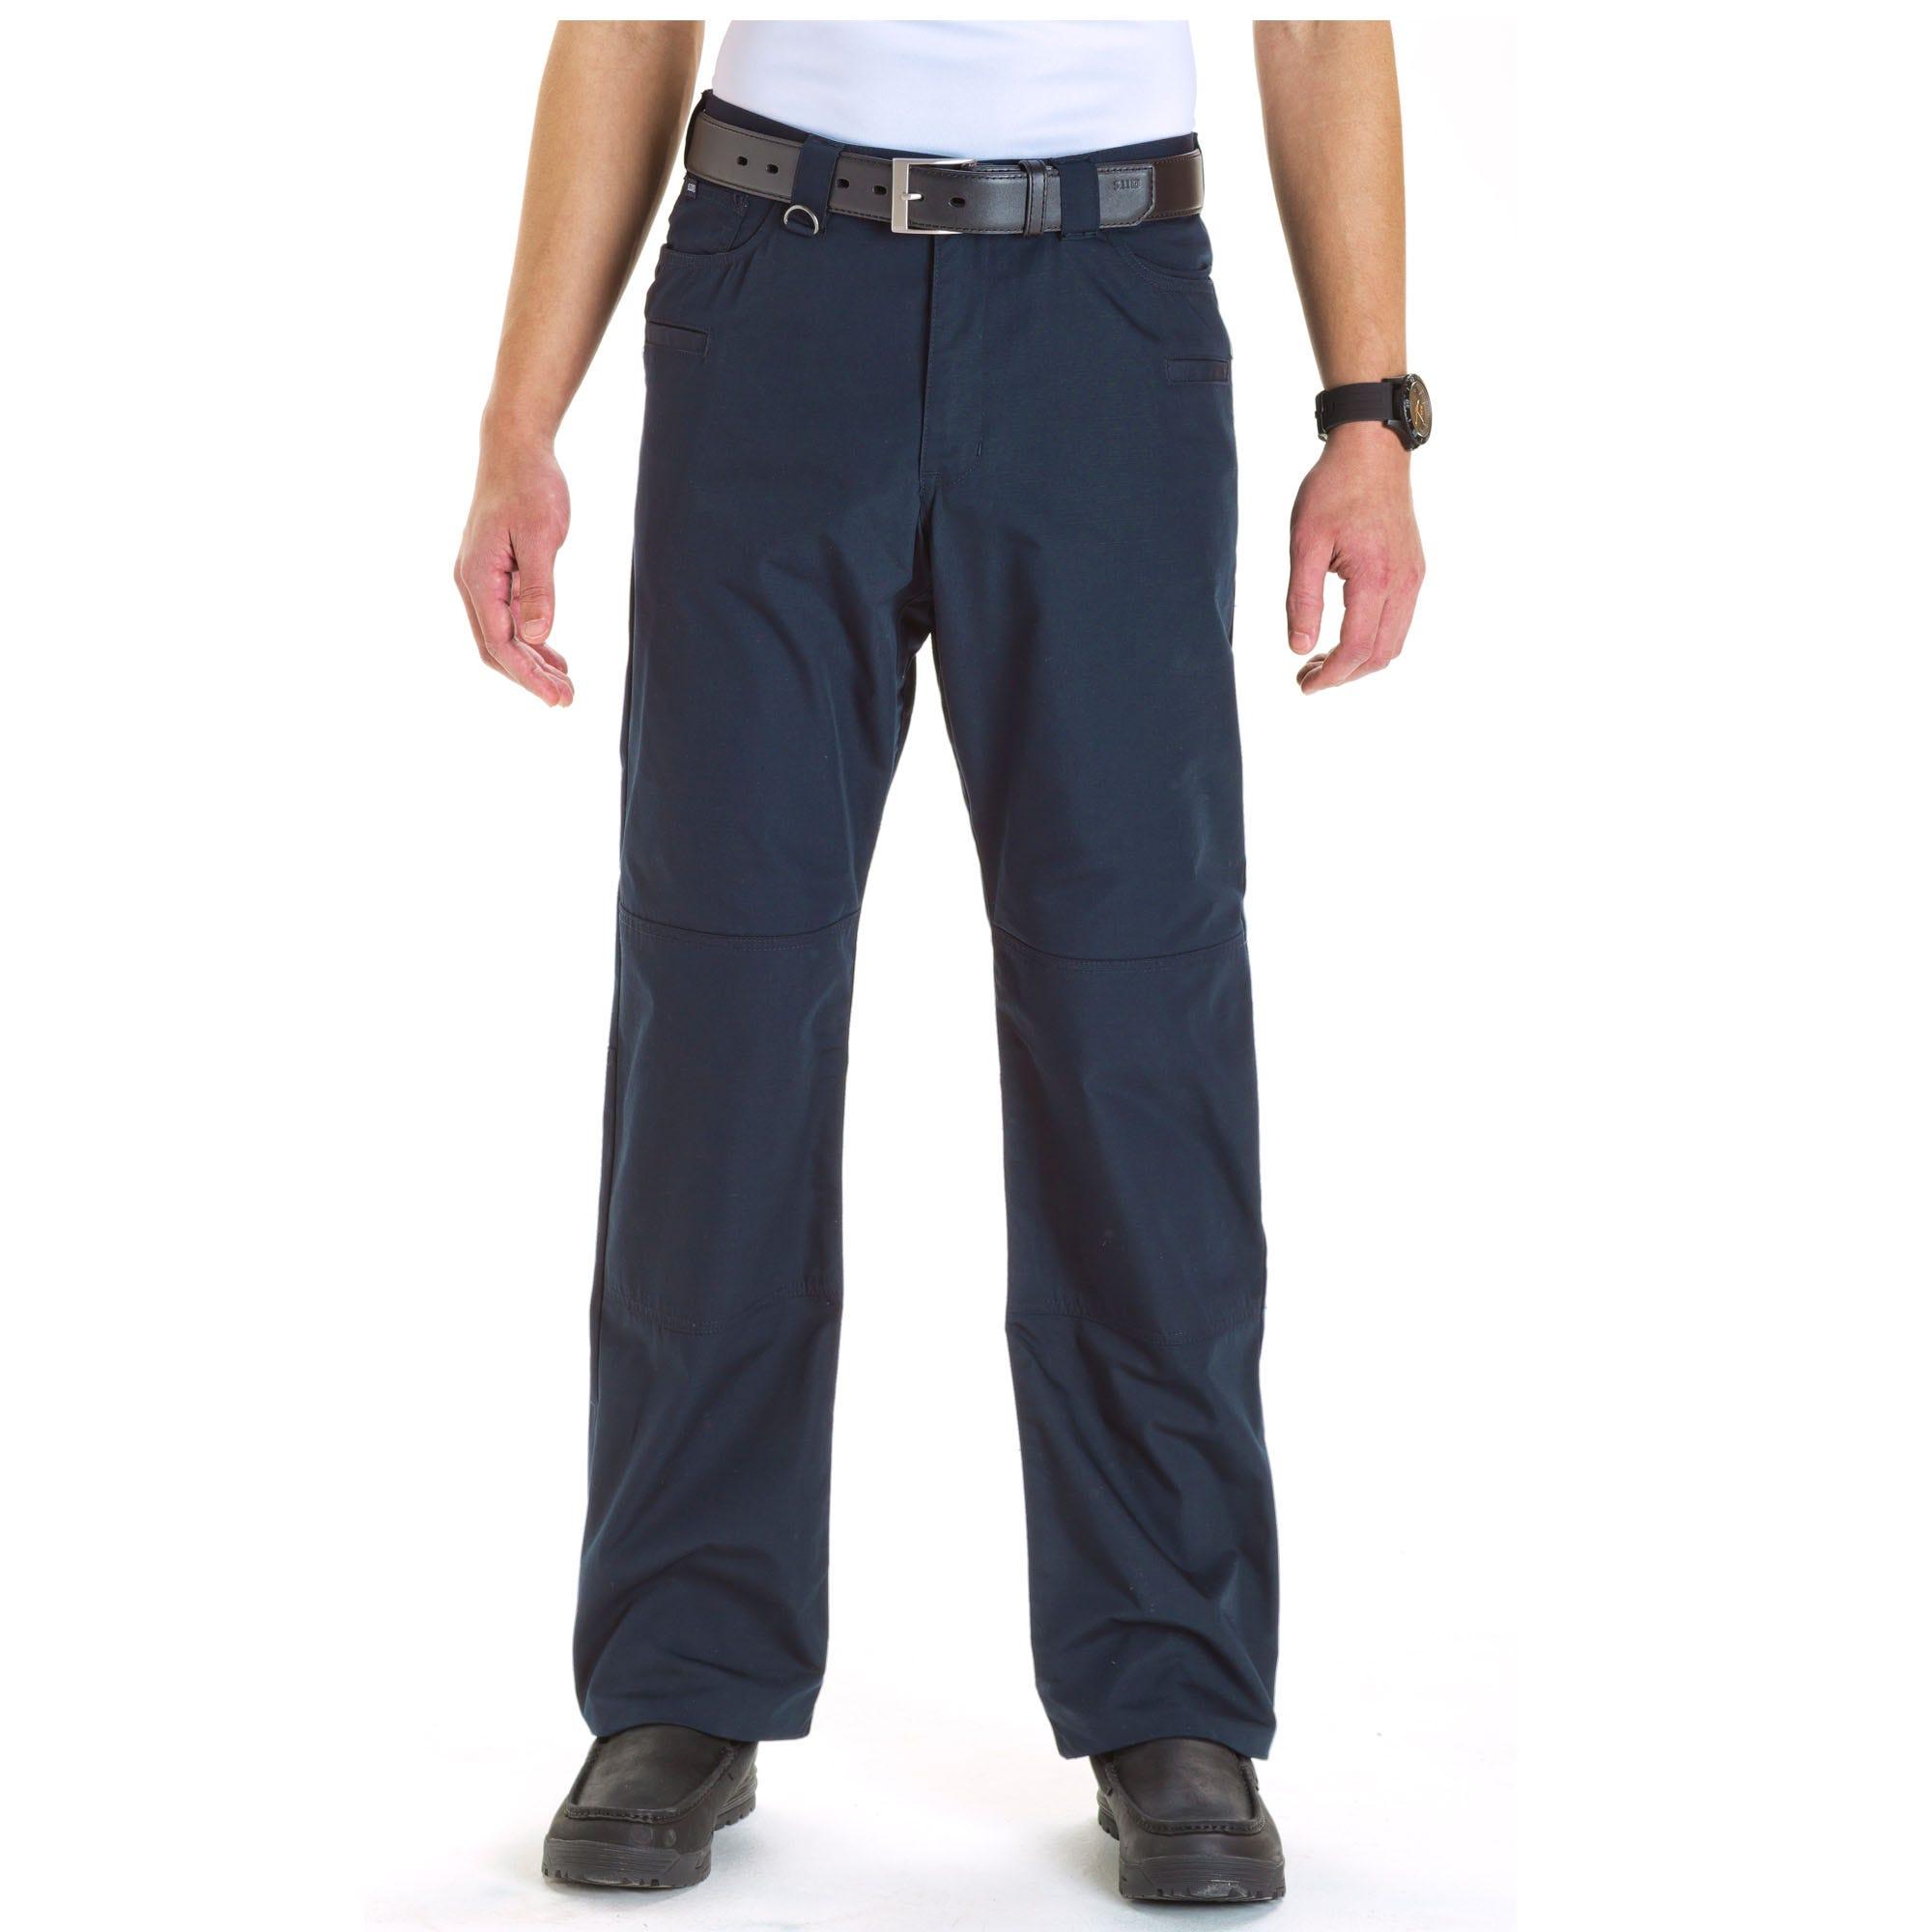 Shop 5 11 Pants Men s Tactical TDU & Cargo Pants